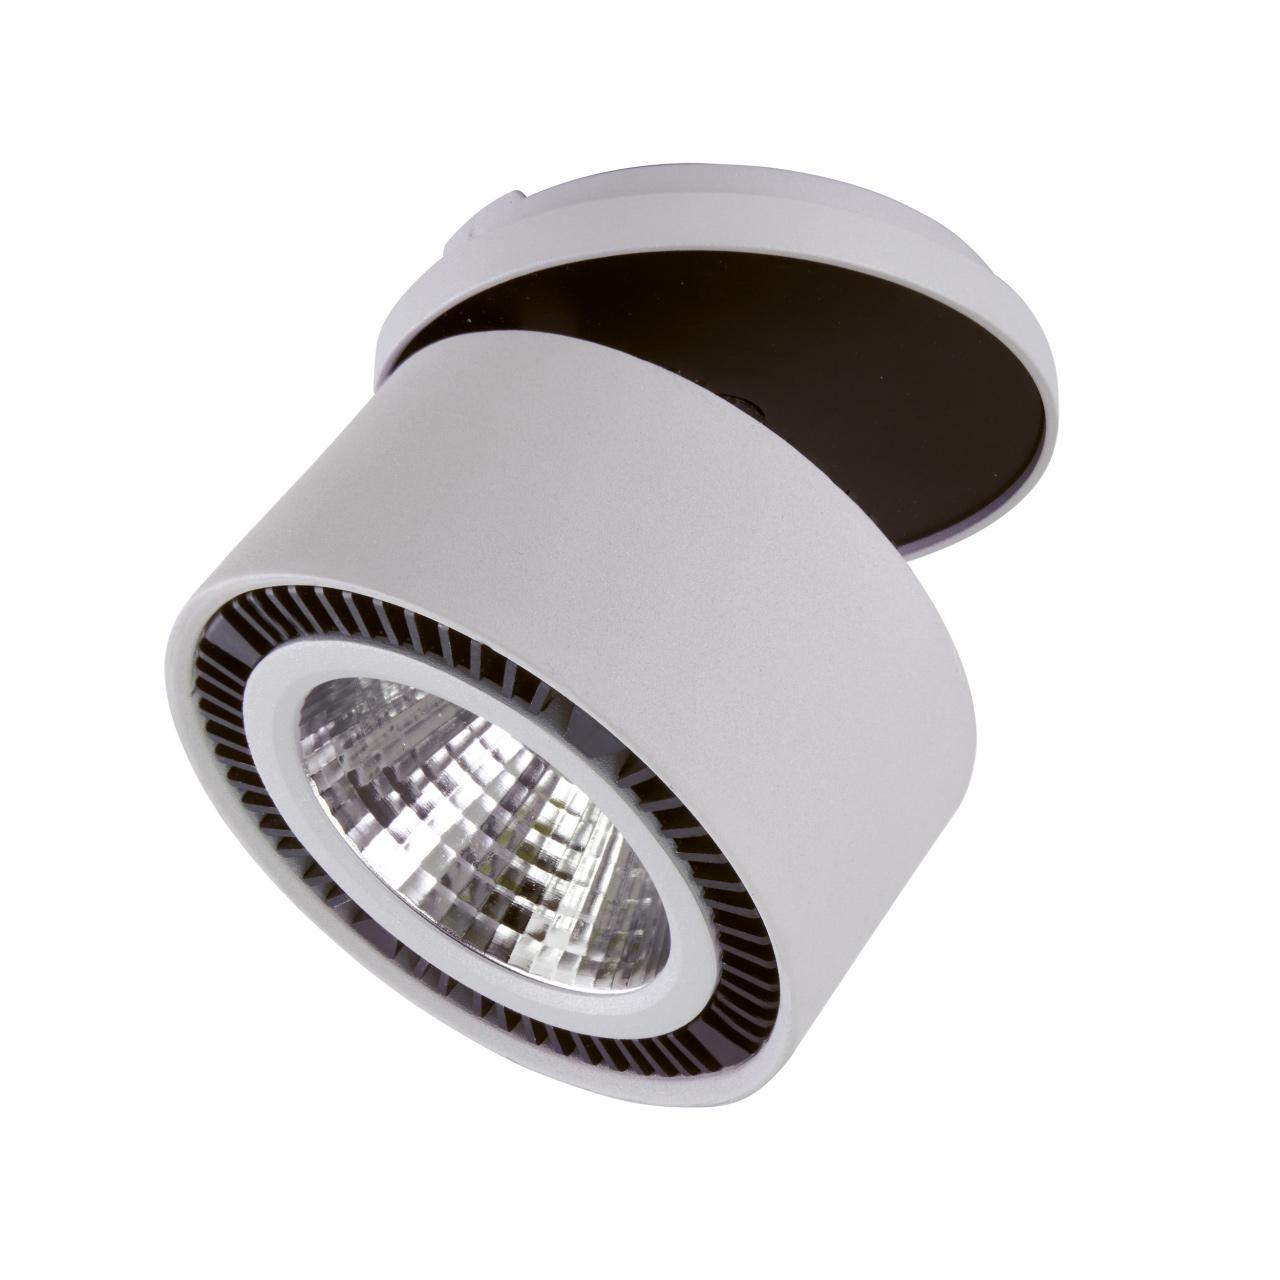 Светильник Forte inca LED 40W 3400LM 30G серый 4000K Lightstar 214849